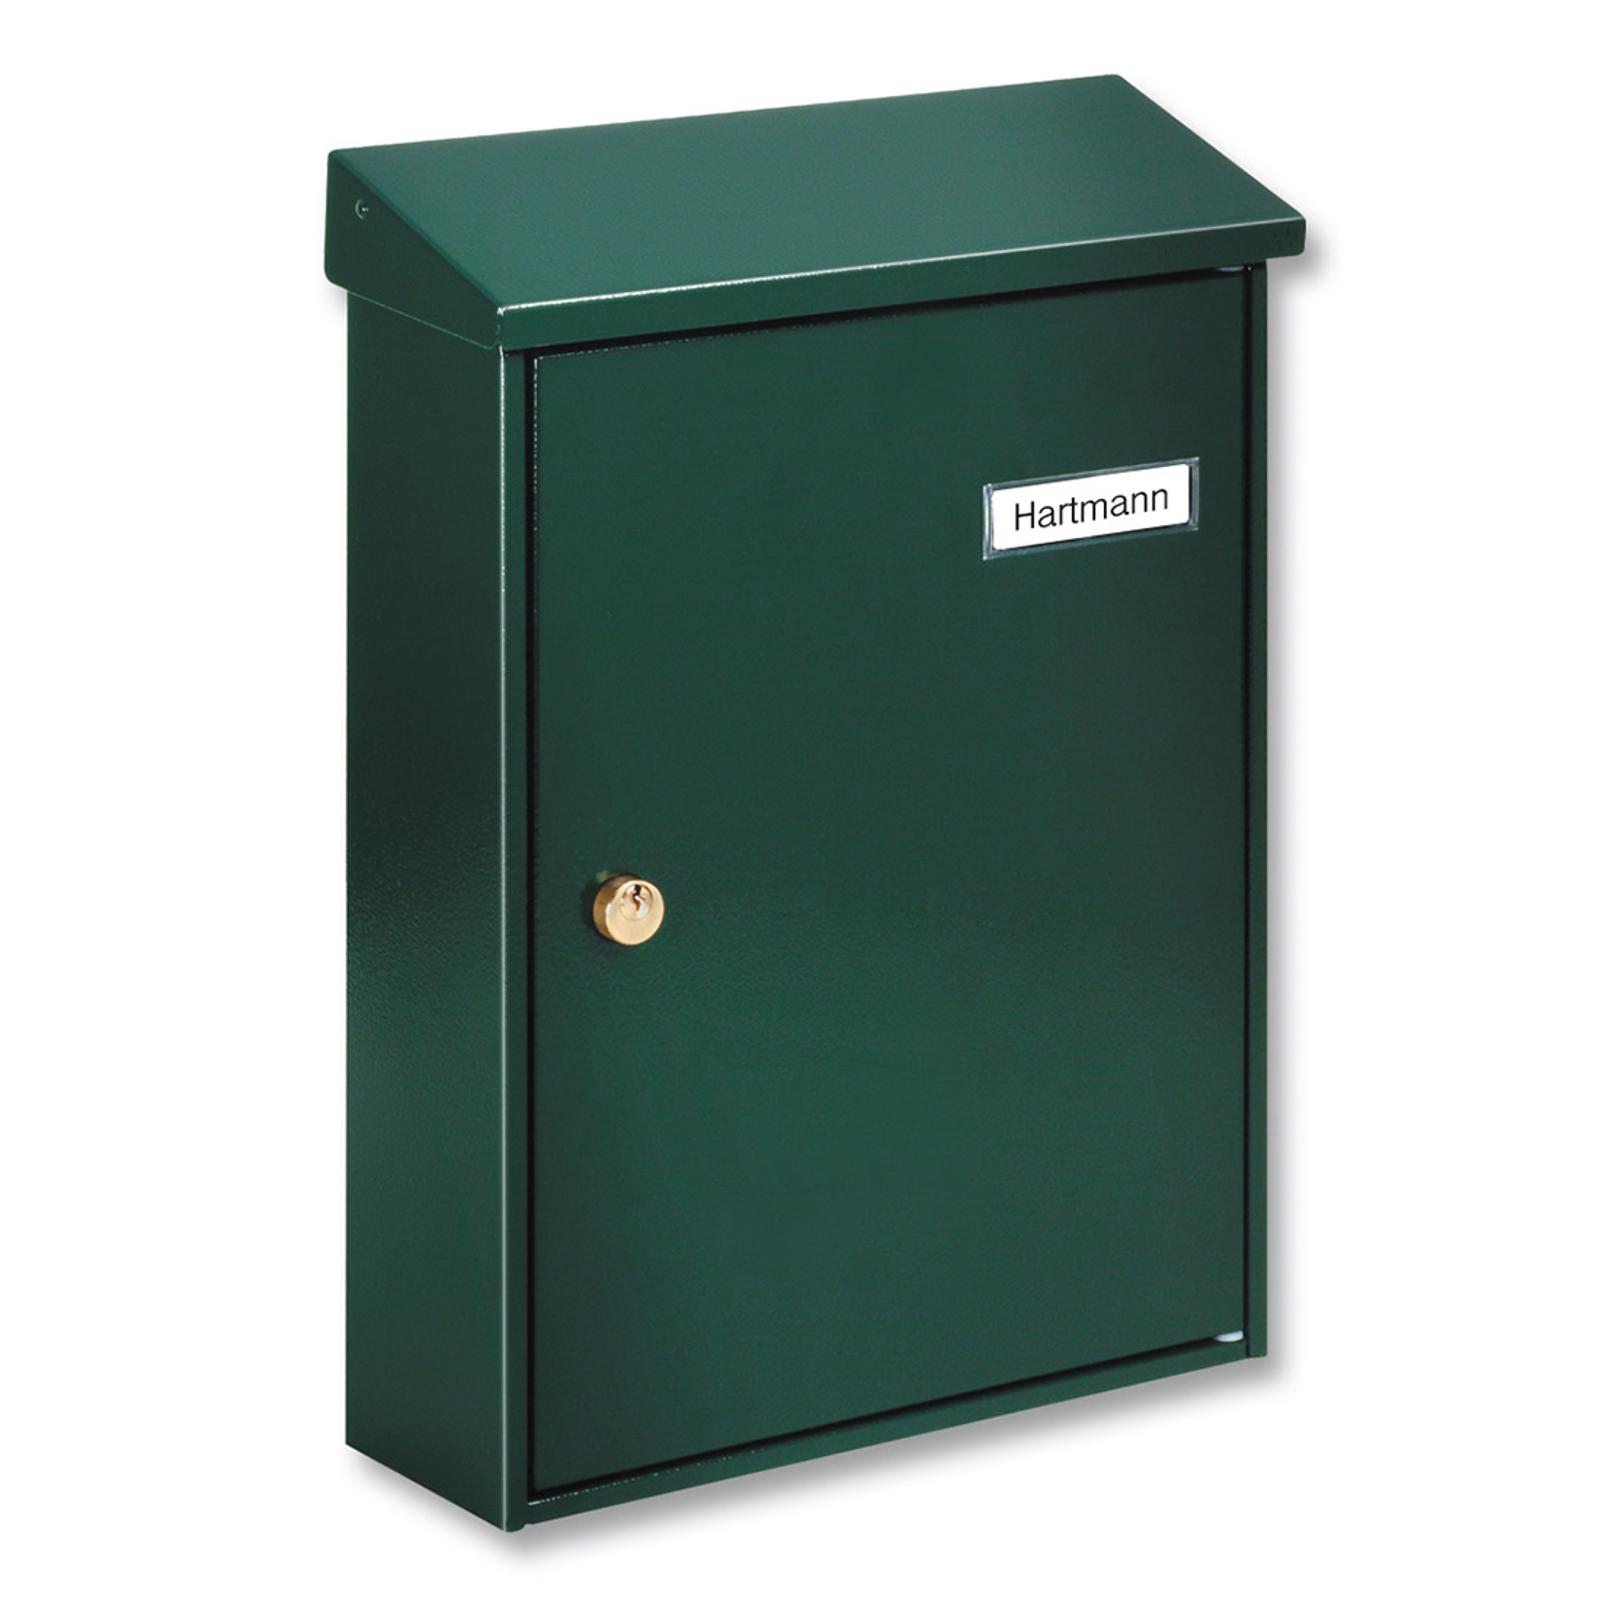 Letter 5832 enkel grøn postkasse